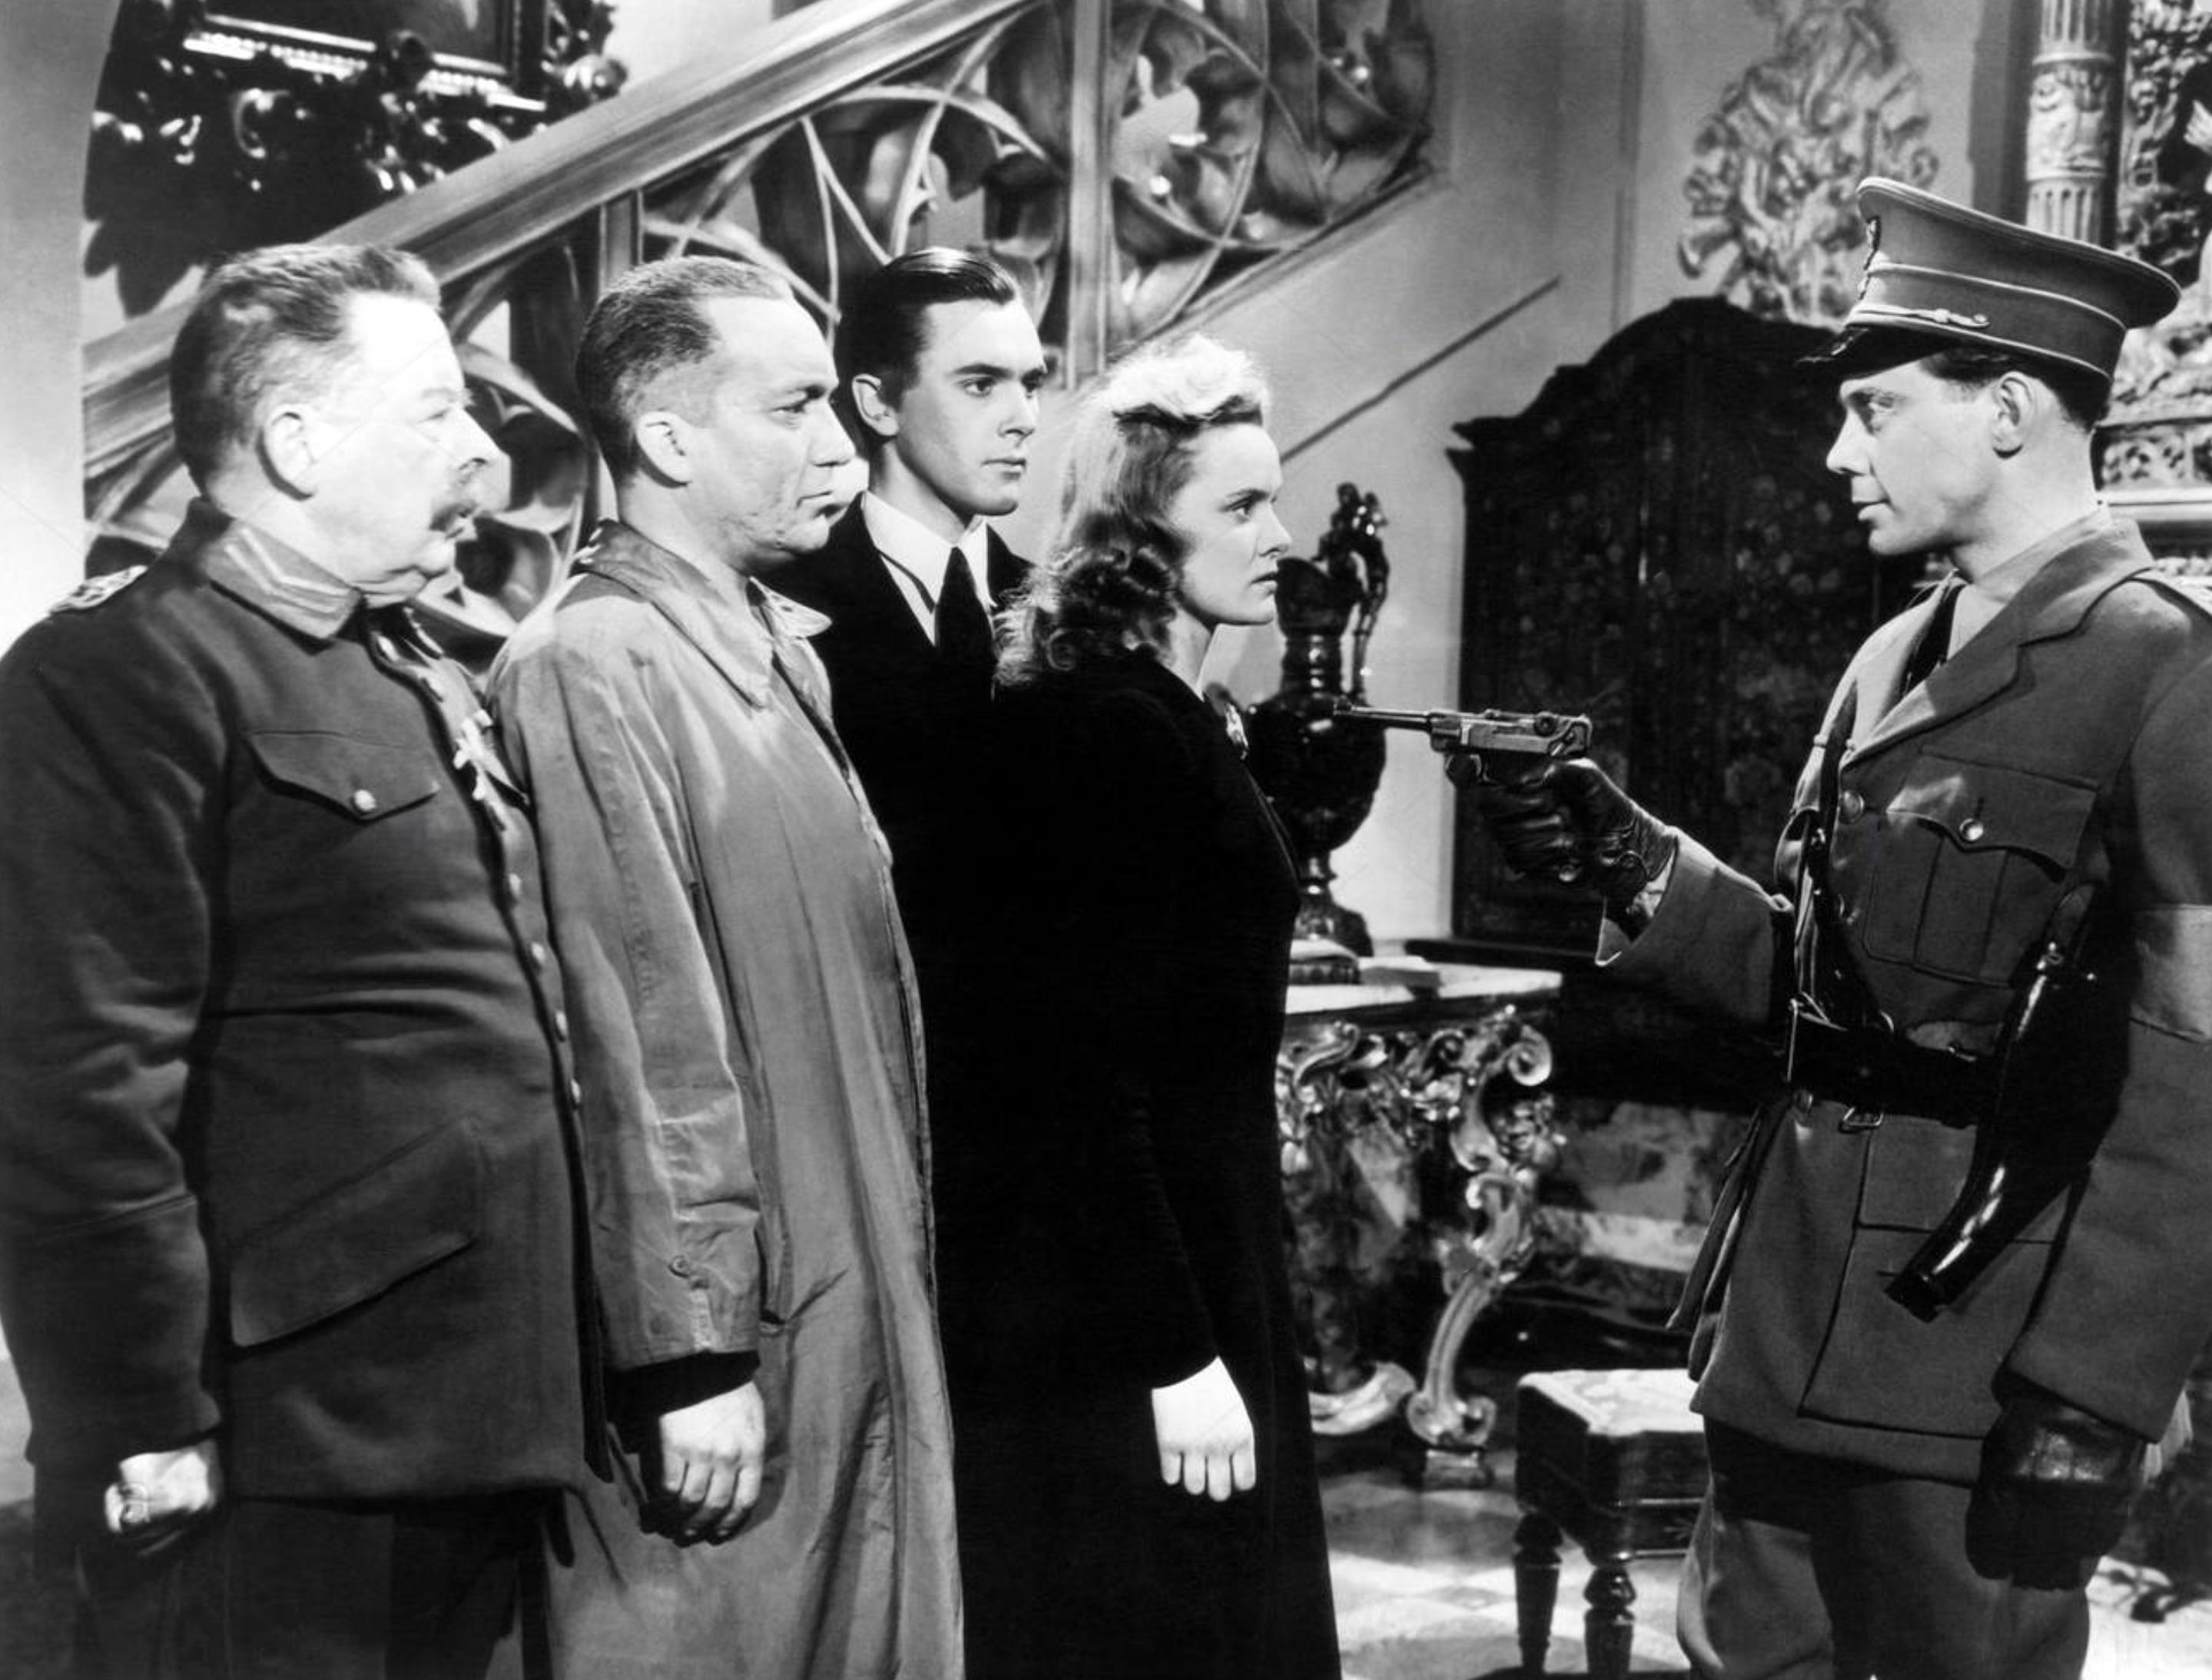 Proudly resisting. L-R, Seymour Hicks, Wilfrid Lawson, Brian Worth, Nova Pilbeam and Marius Goring in Pastor Hall (1940).